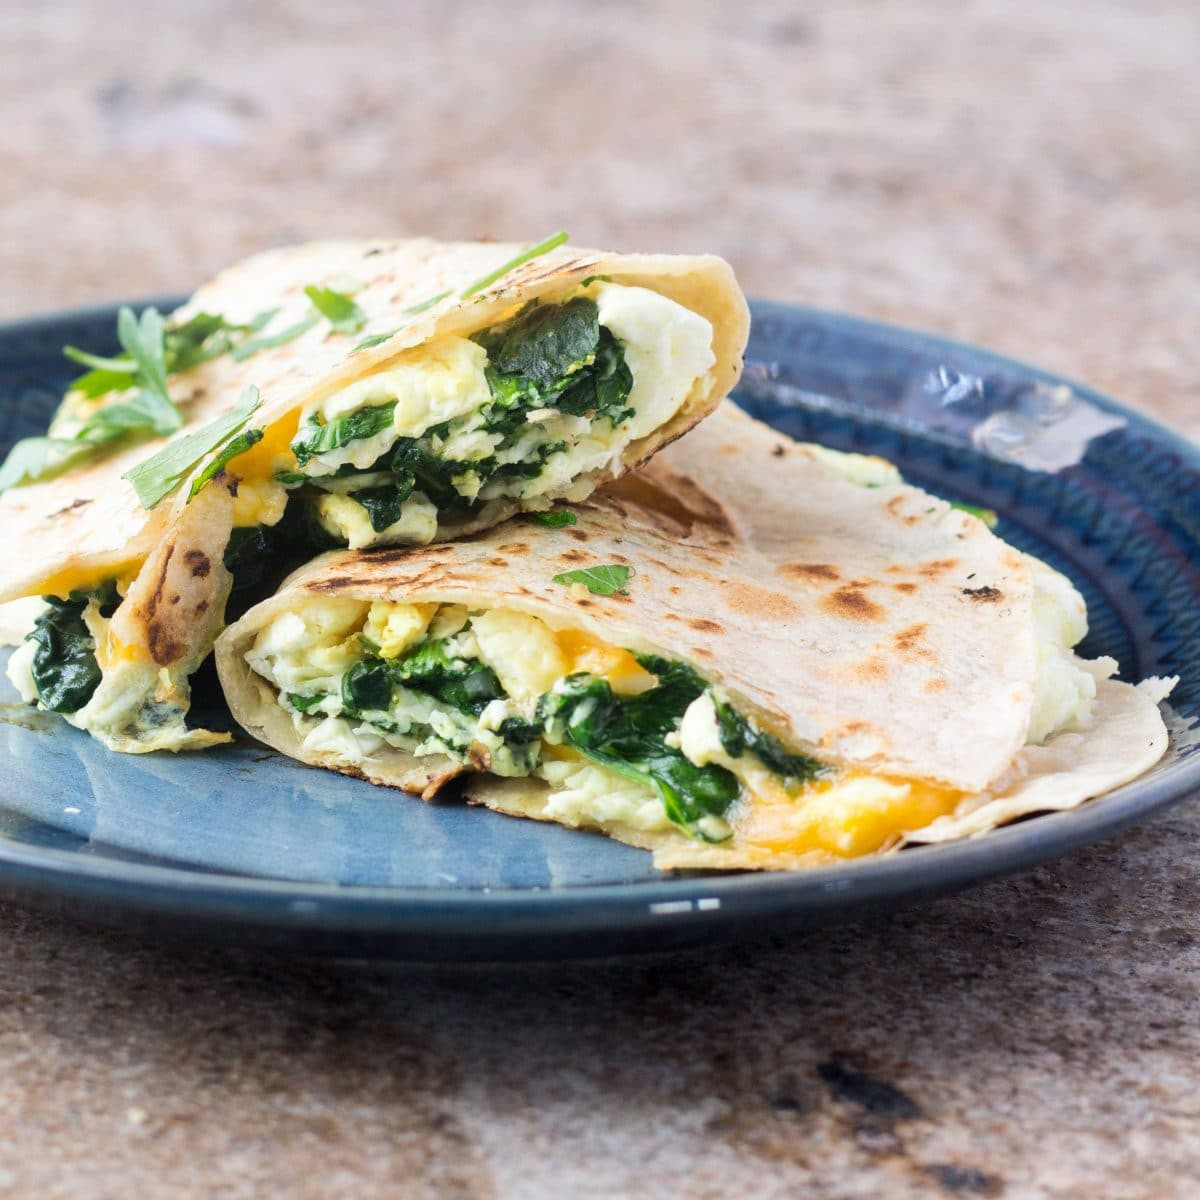 Healthy Quesadillas Recipes  Healthy Breakfast Quesadilla Gluten Free Ve arian